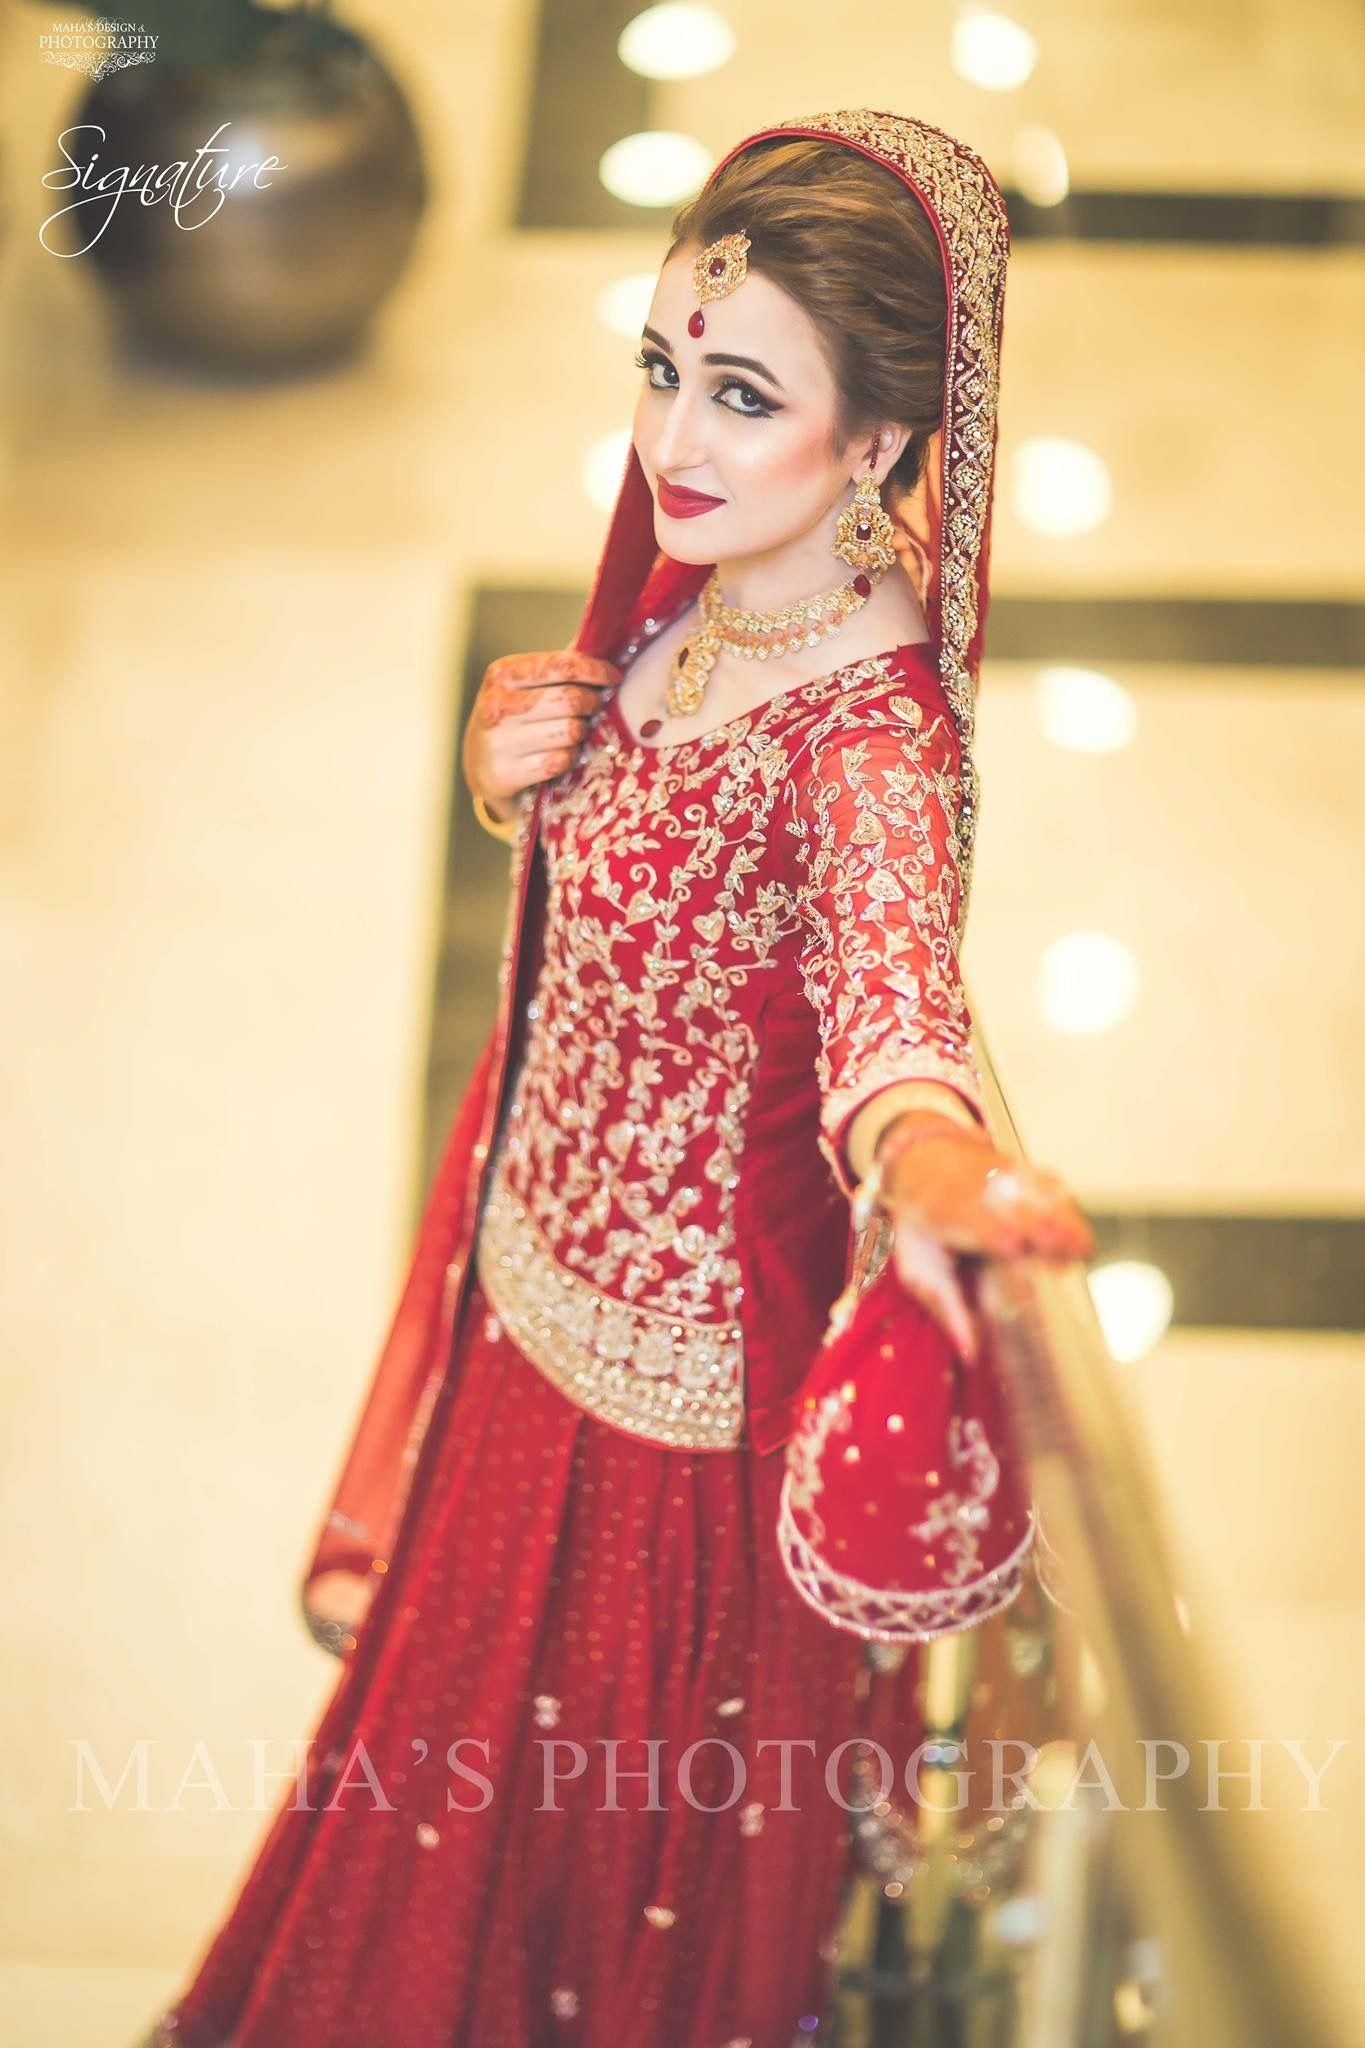 Pin by Eram Alam on Bollywood Style + Desi Shaadi | Pinterest ...